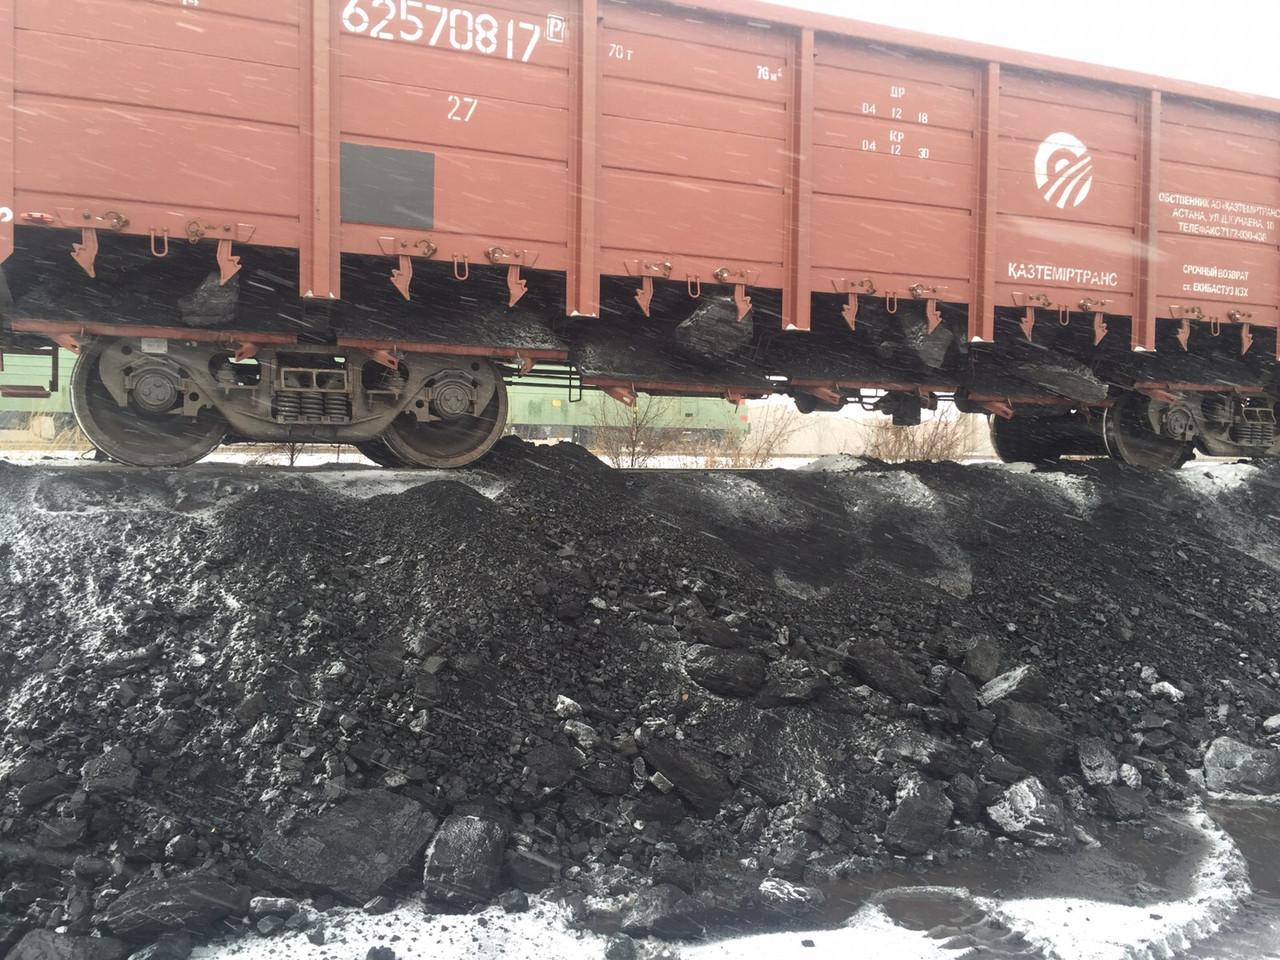 «КТЖ»: повышения тарифов на перевозку угля не будет